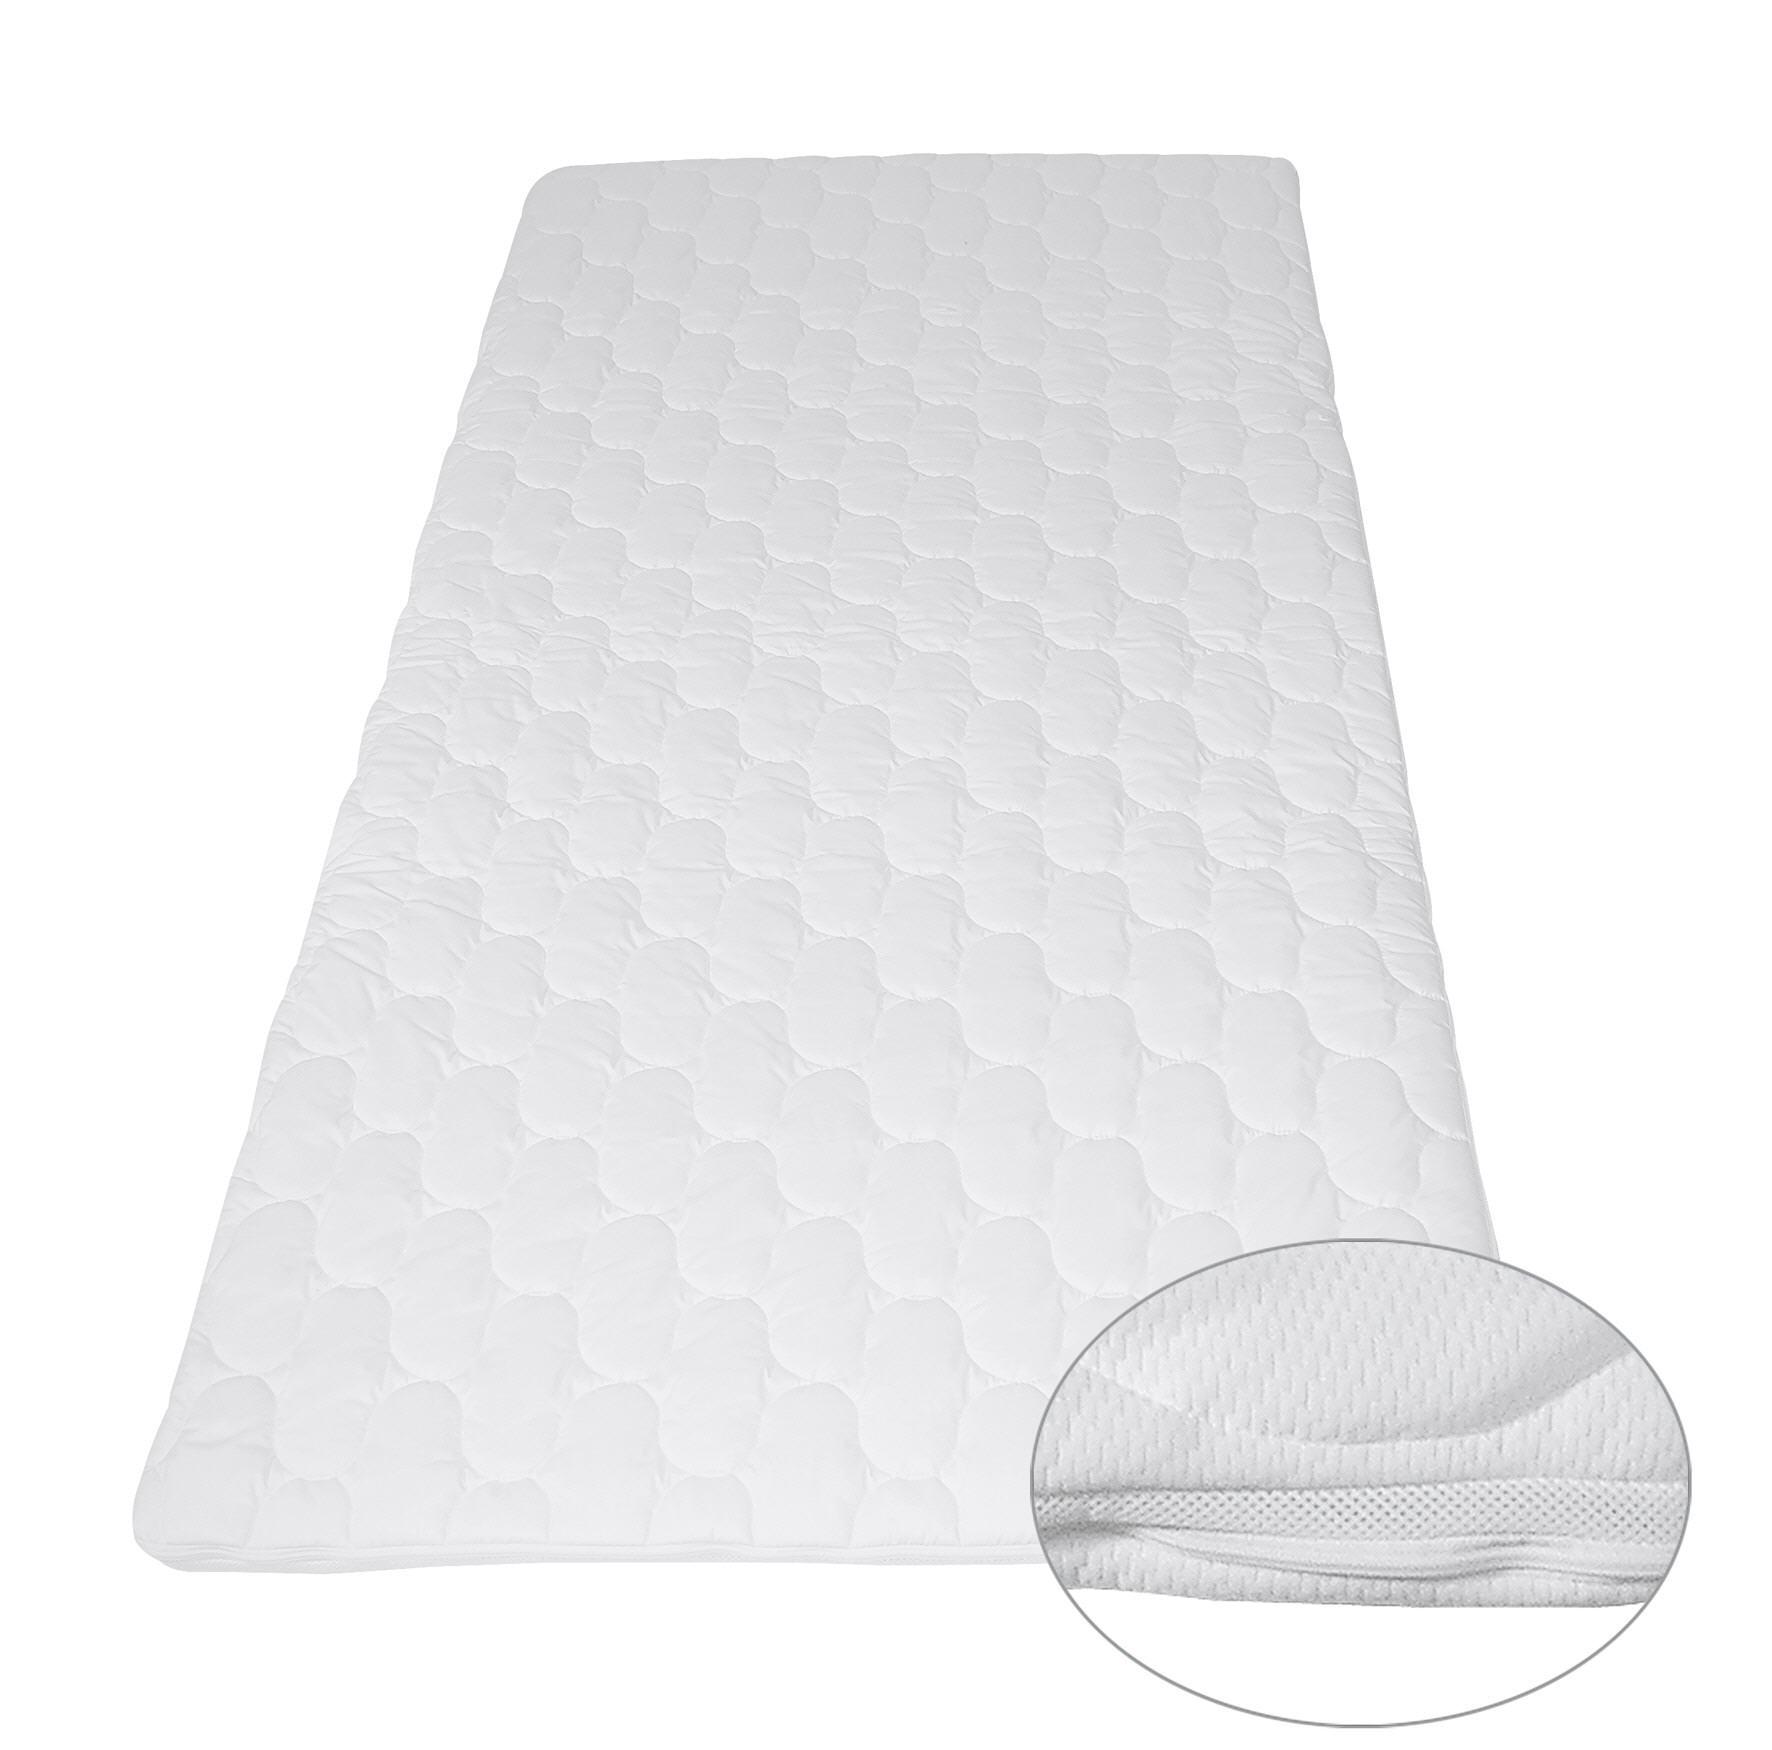 topper f r hotel matratzen g nstig online bestellen. Black Bedroom Furniture Sets. Home Design Ideas